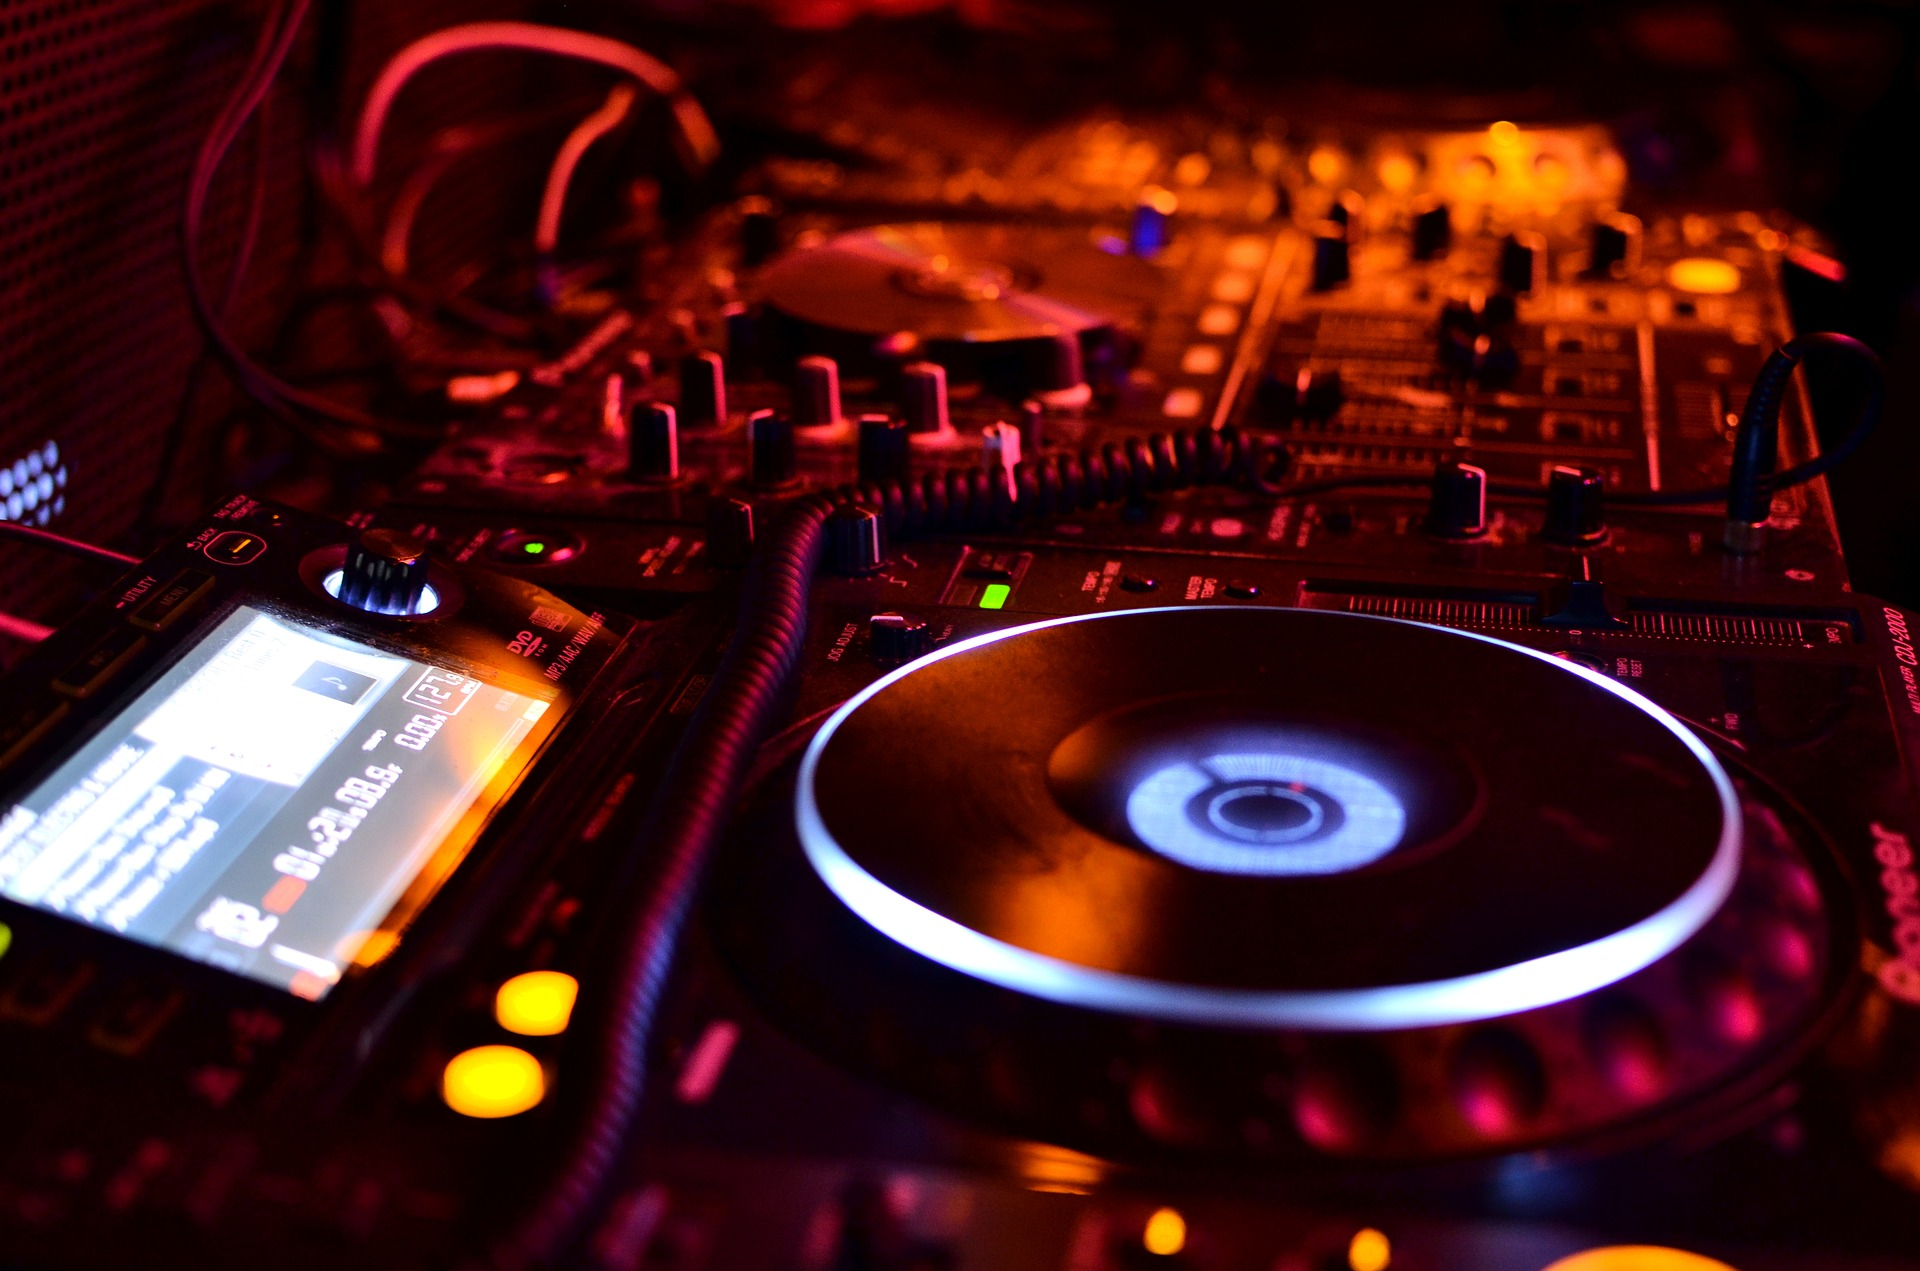 6 x Sponsored Tweets From A Top UK DJ